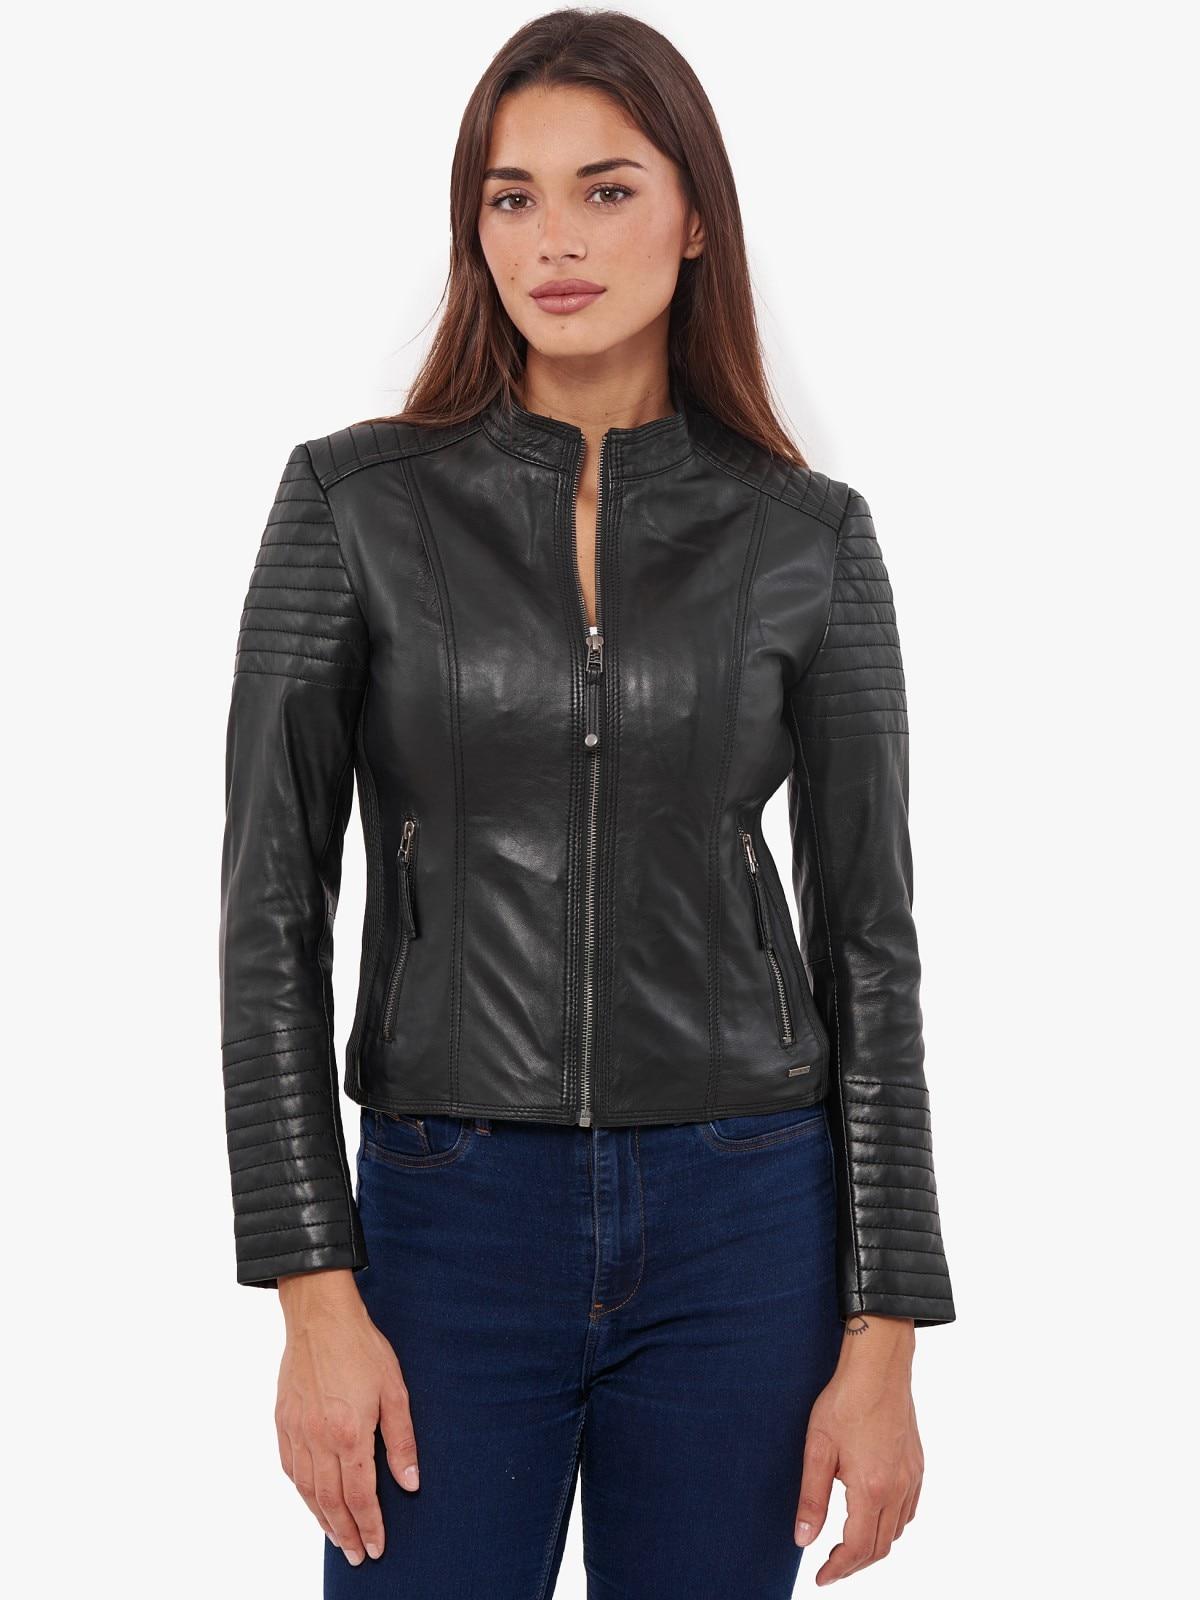 VAINAS European Brand  Women Genuine leather jacket for women Real sheep Motorcycle jackets Biker Queen